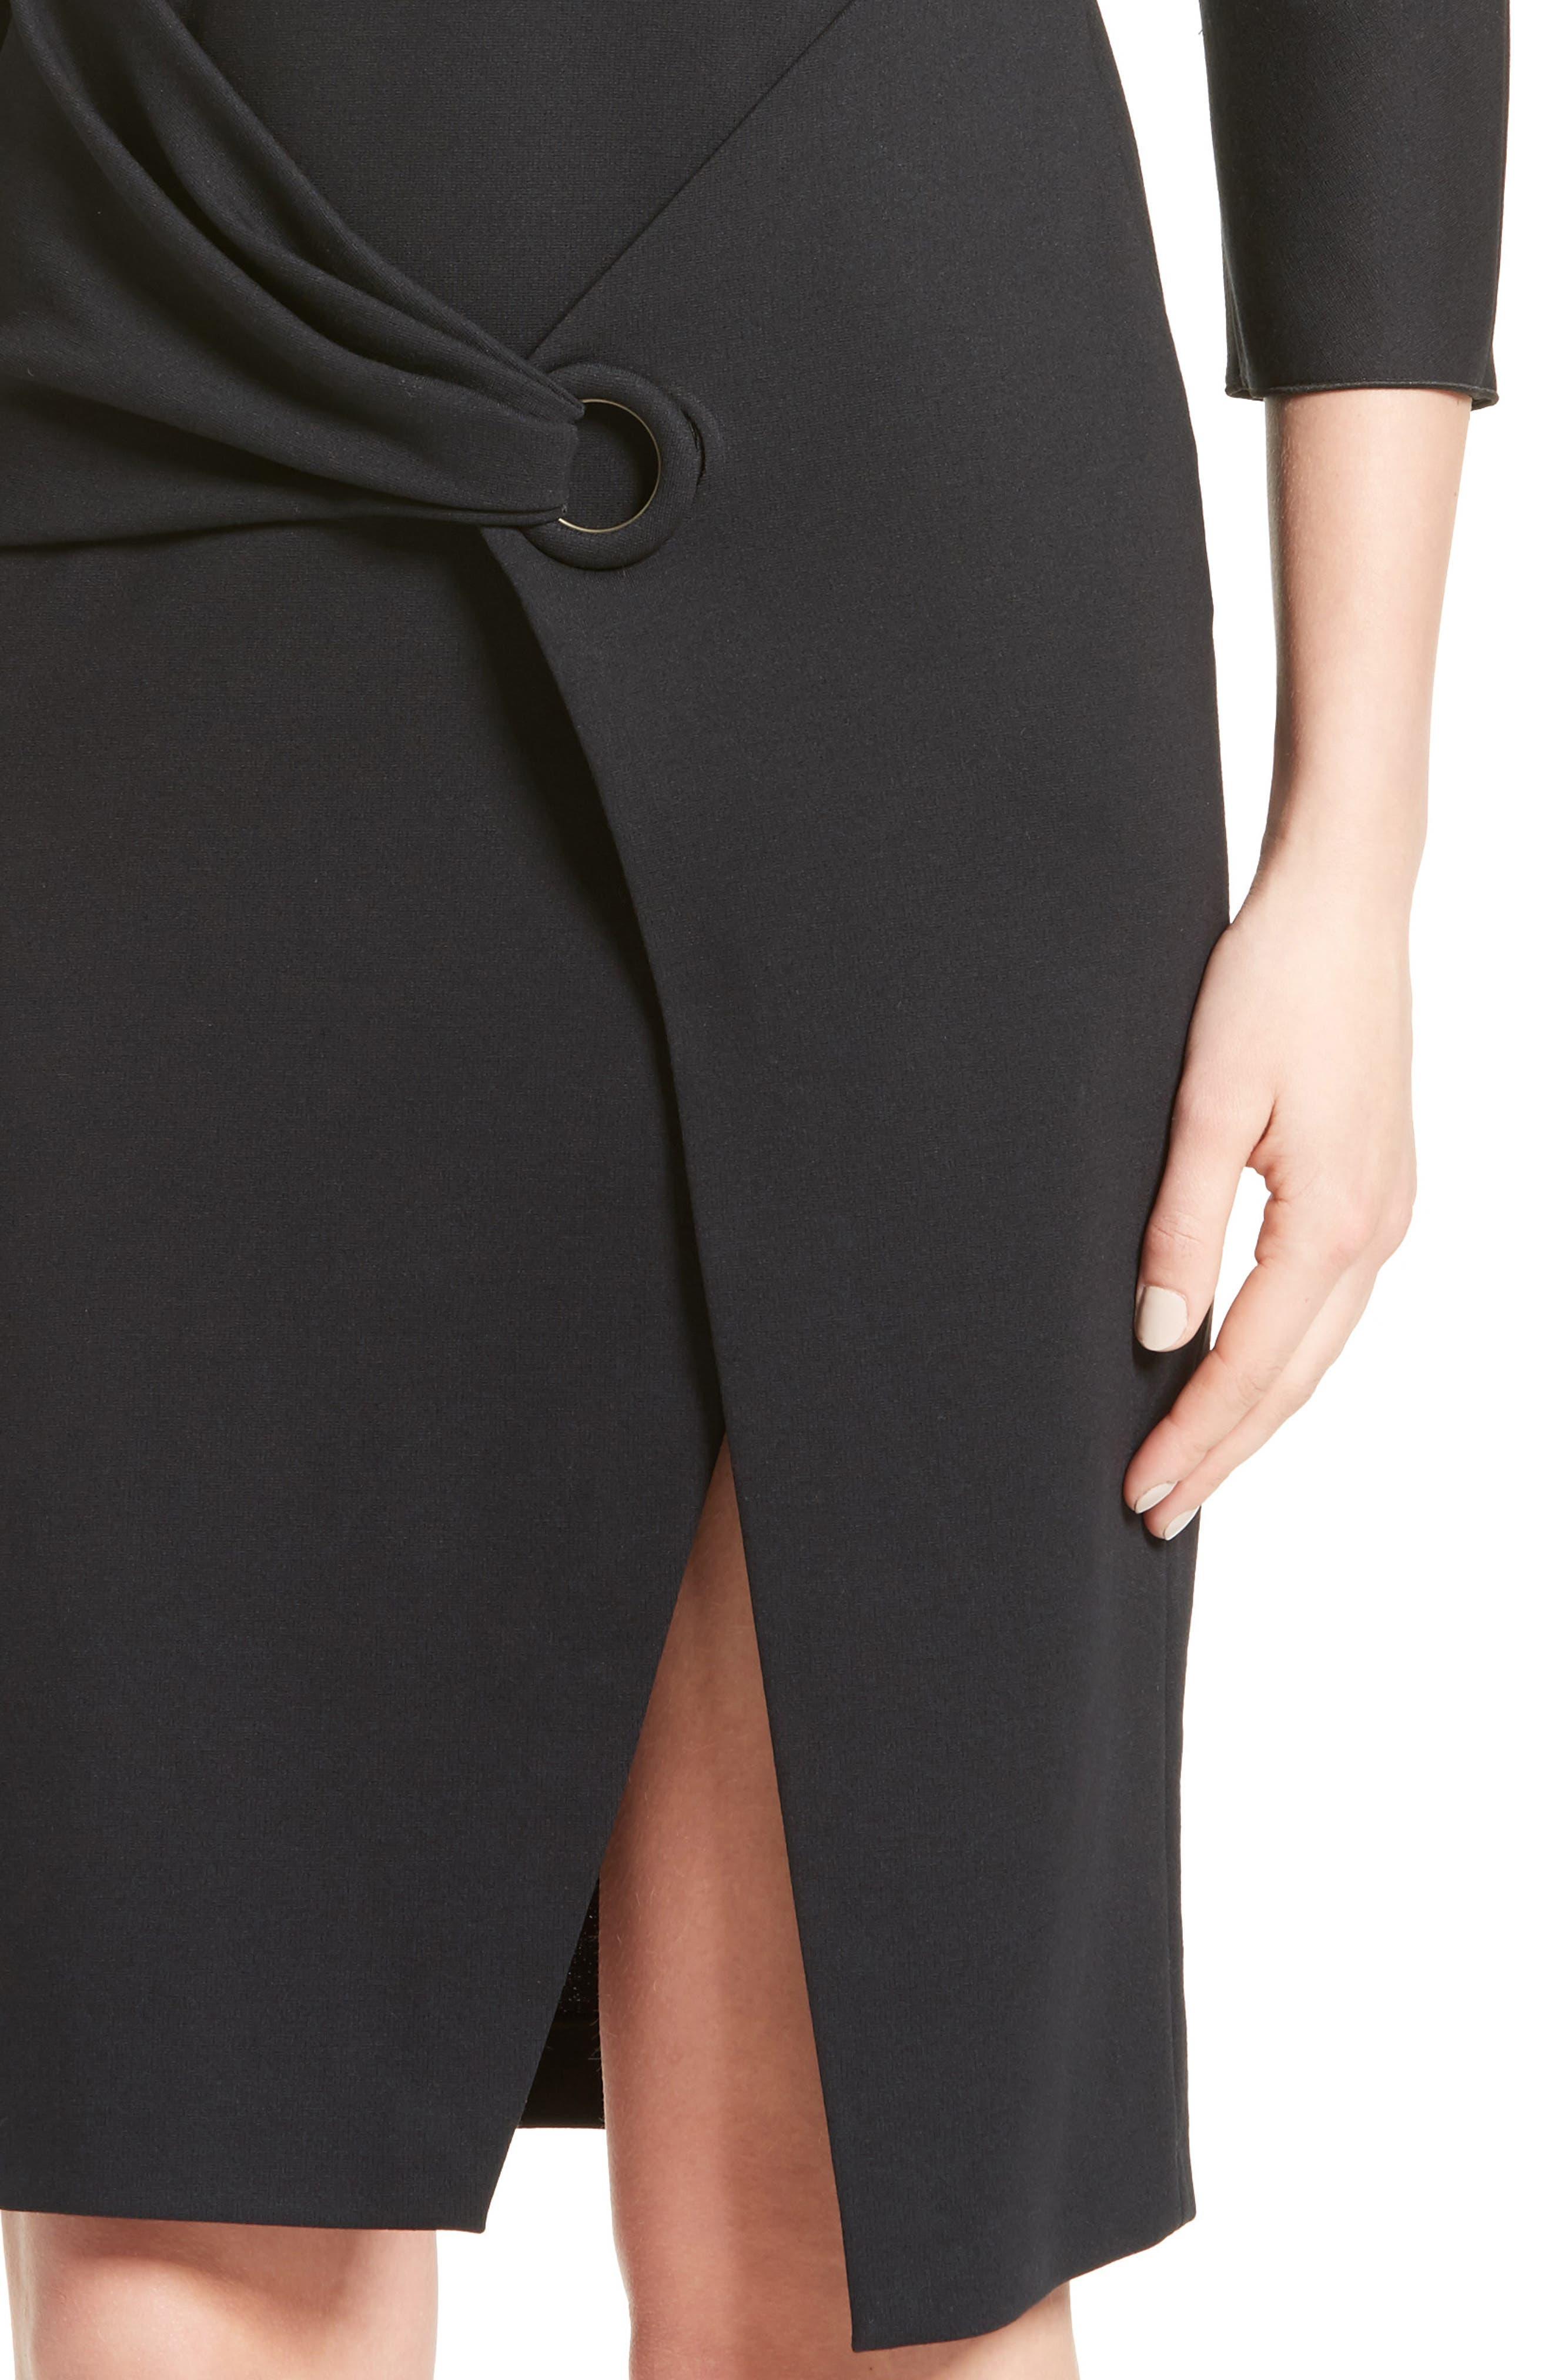 Grommet Detail Milano Jersey Dress,                             Alternate thumbnail 4, color,                             001